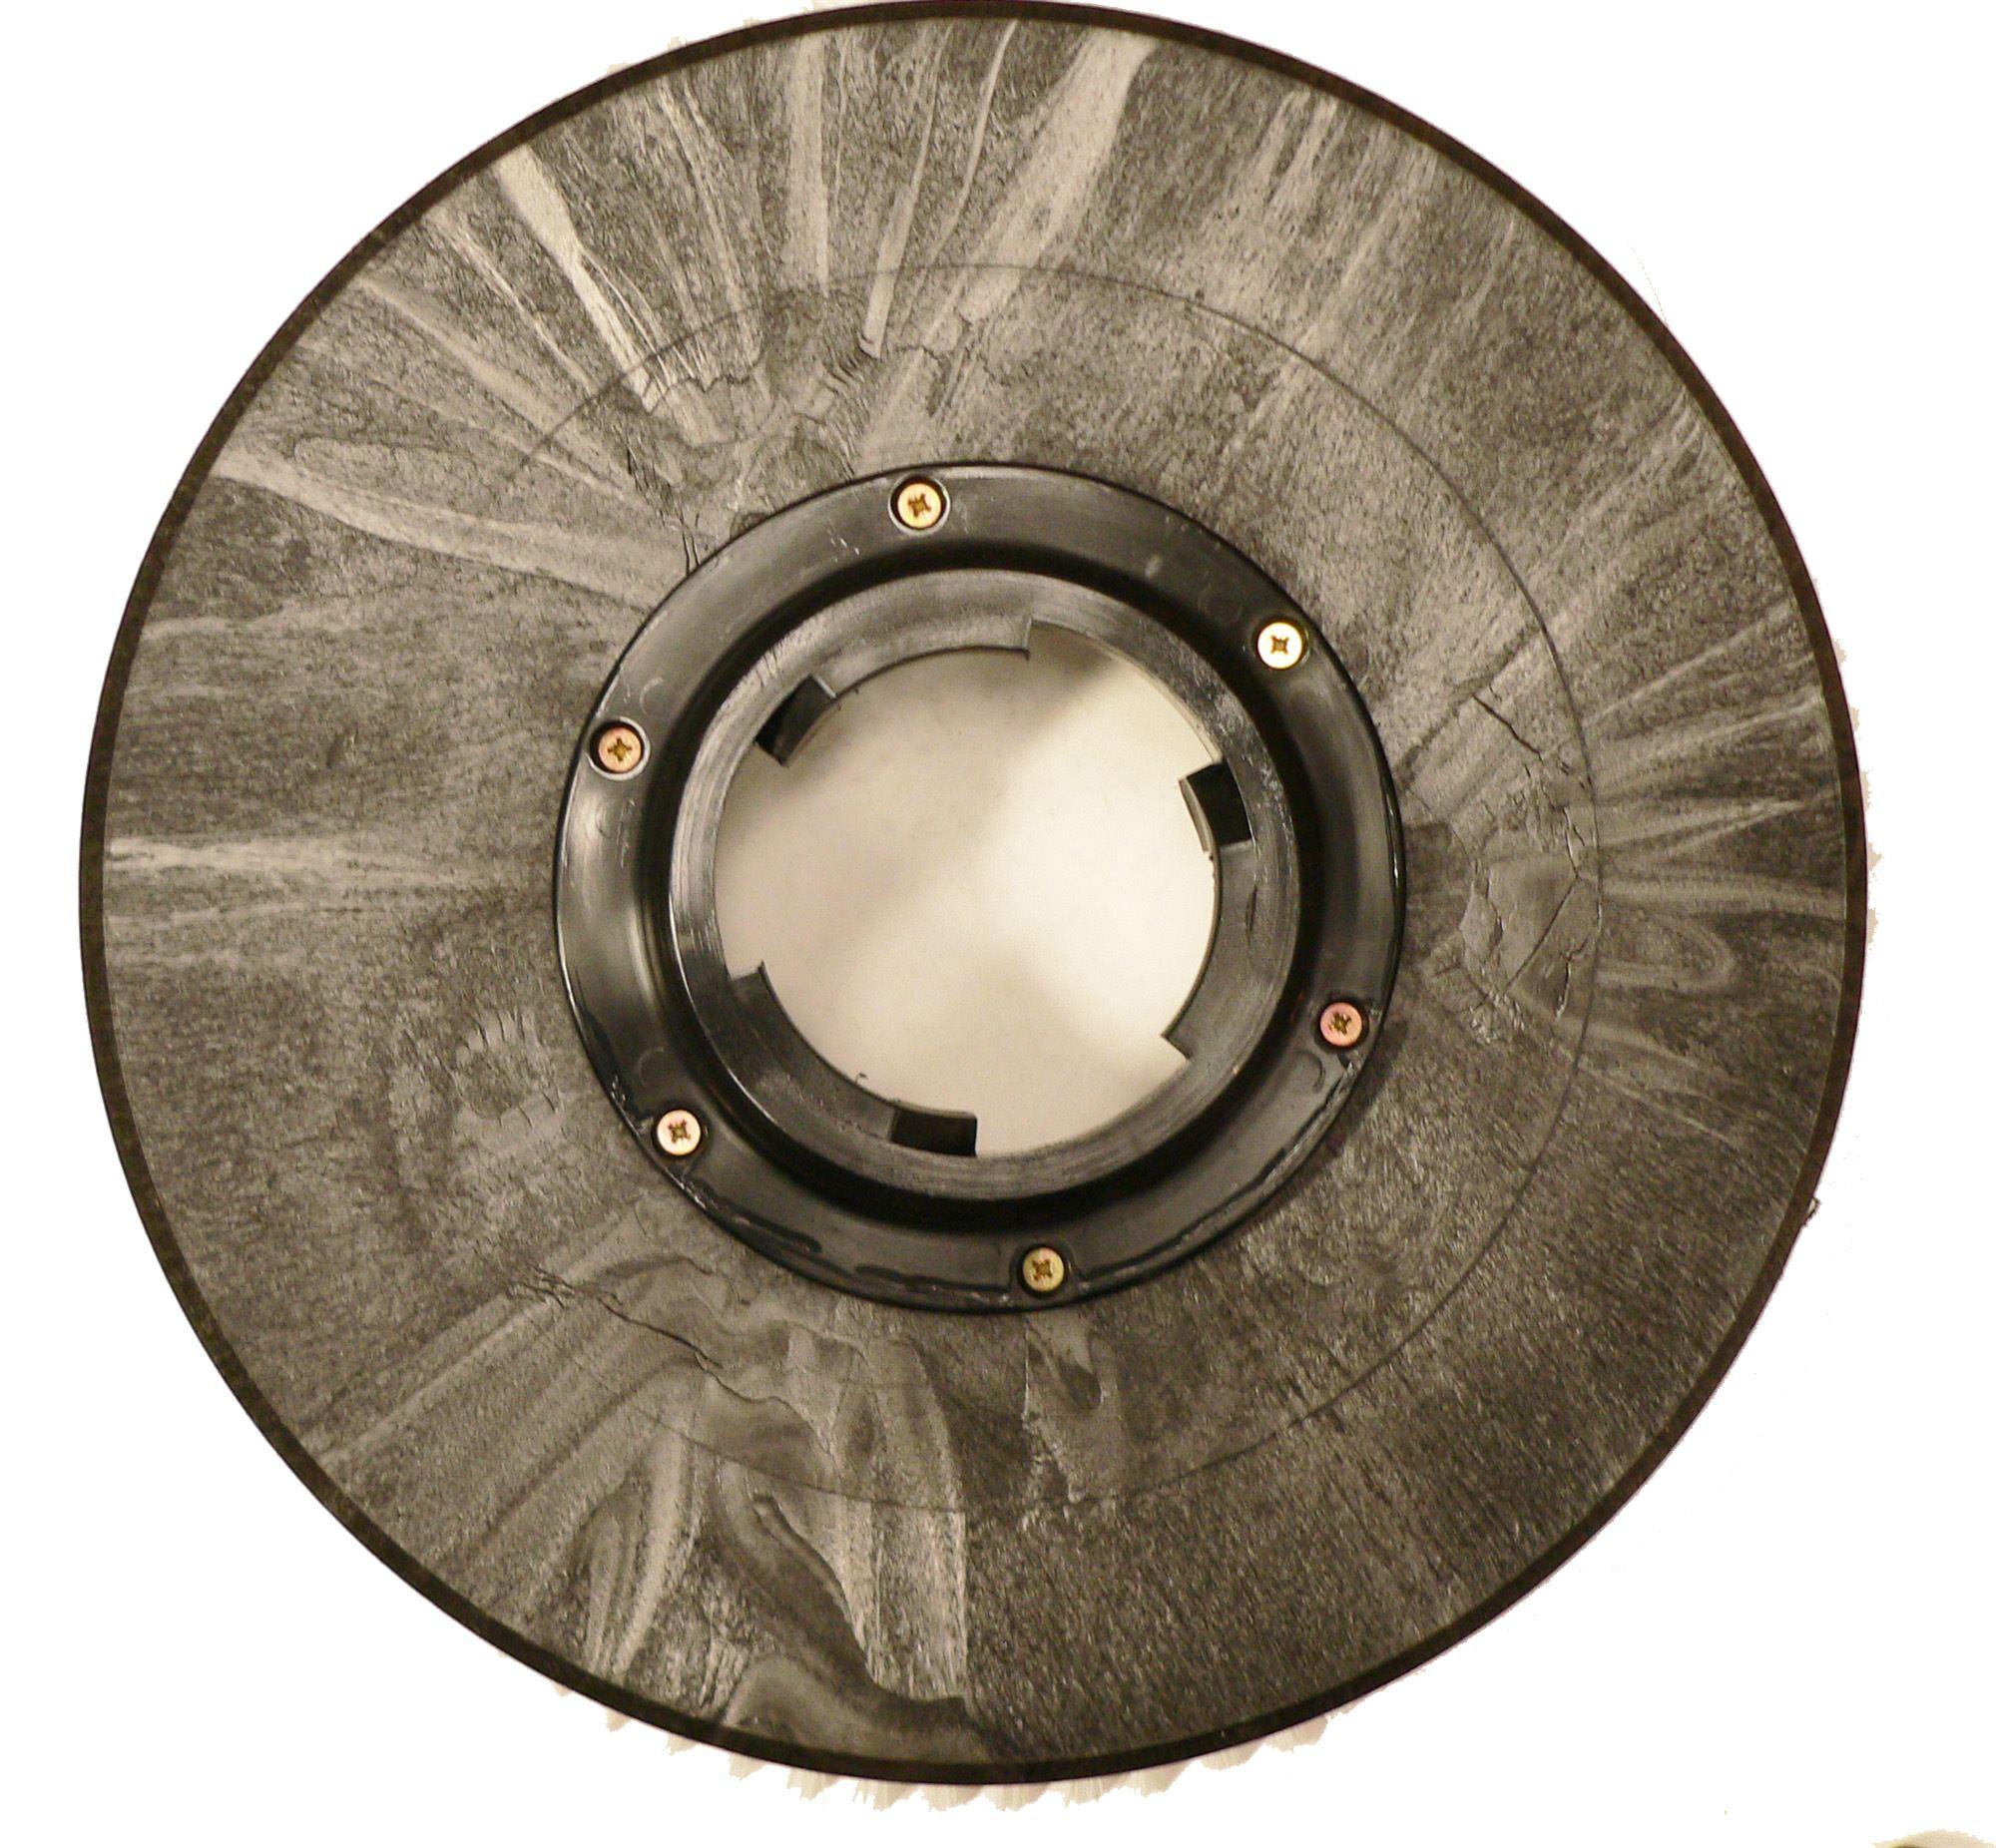 brosse r curer perlon taski ergodisc monobrosse autolaveuse. Black Bedroom Furniture Sets. Home Design Ideas